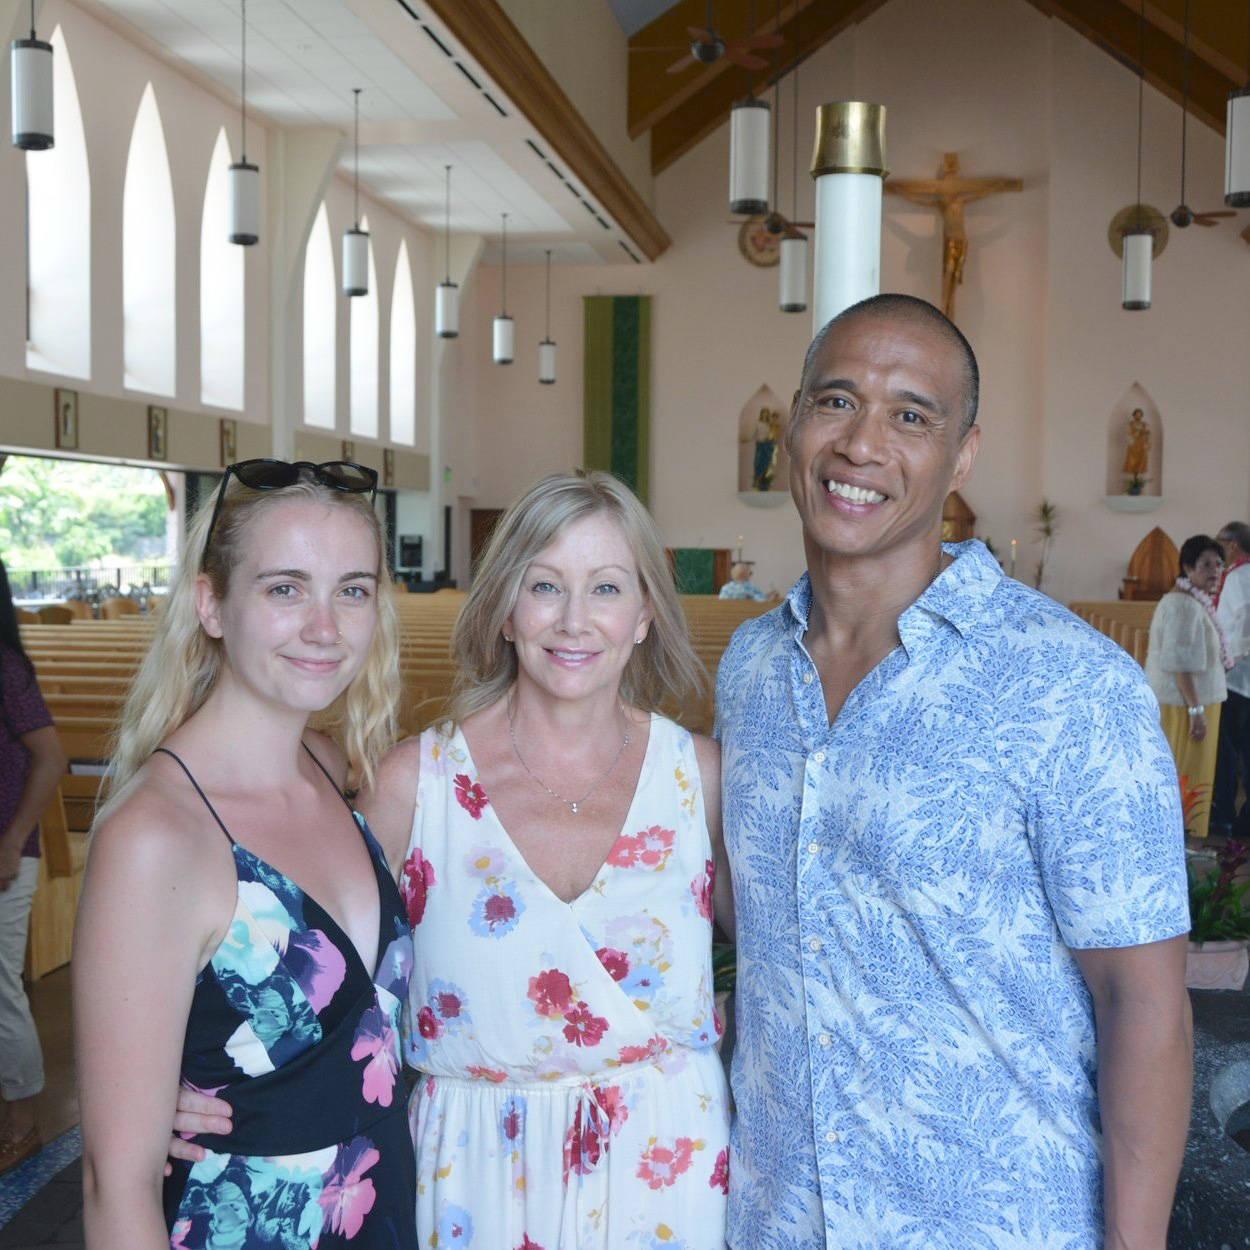 Emma Walton, Tracey Walton and Apollo Edmilao visited a church on Kona during a family trip. (Edmilao photo/Special to the Langley Advance Times)